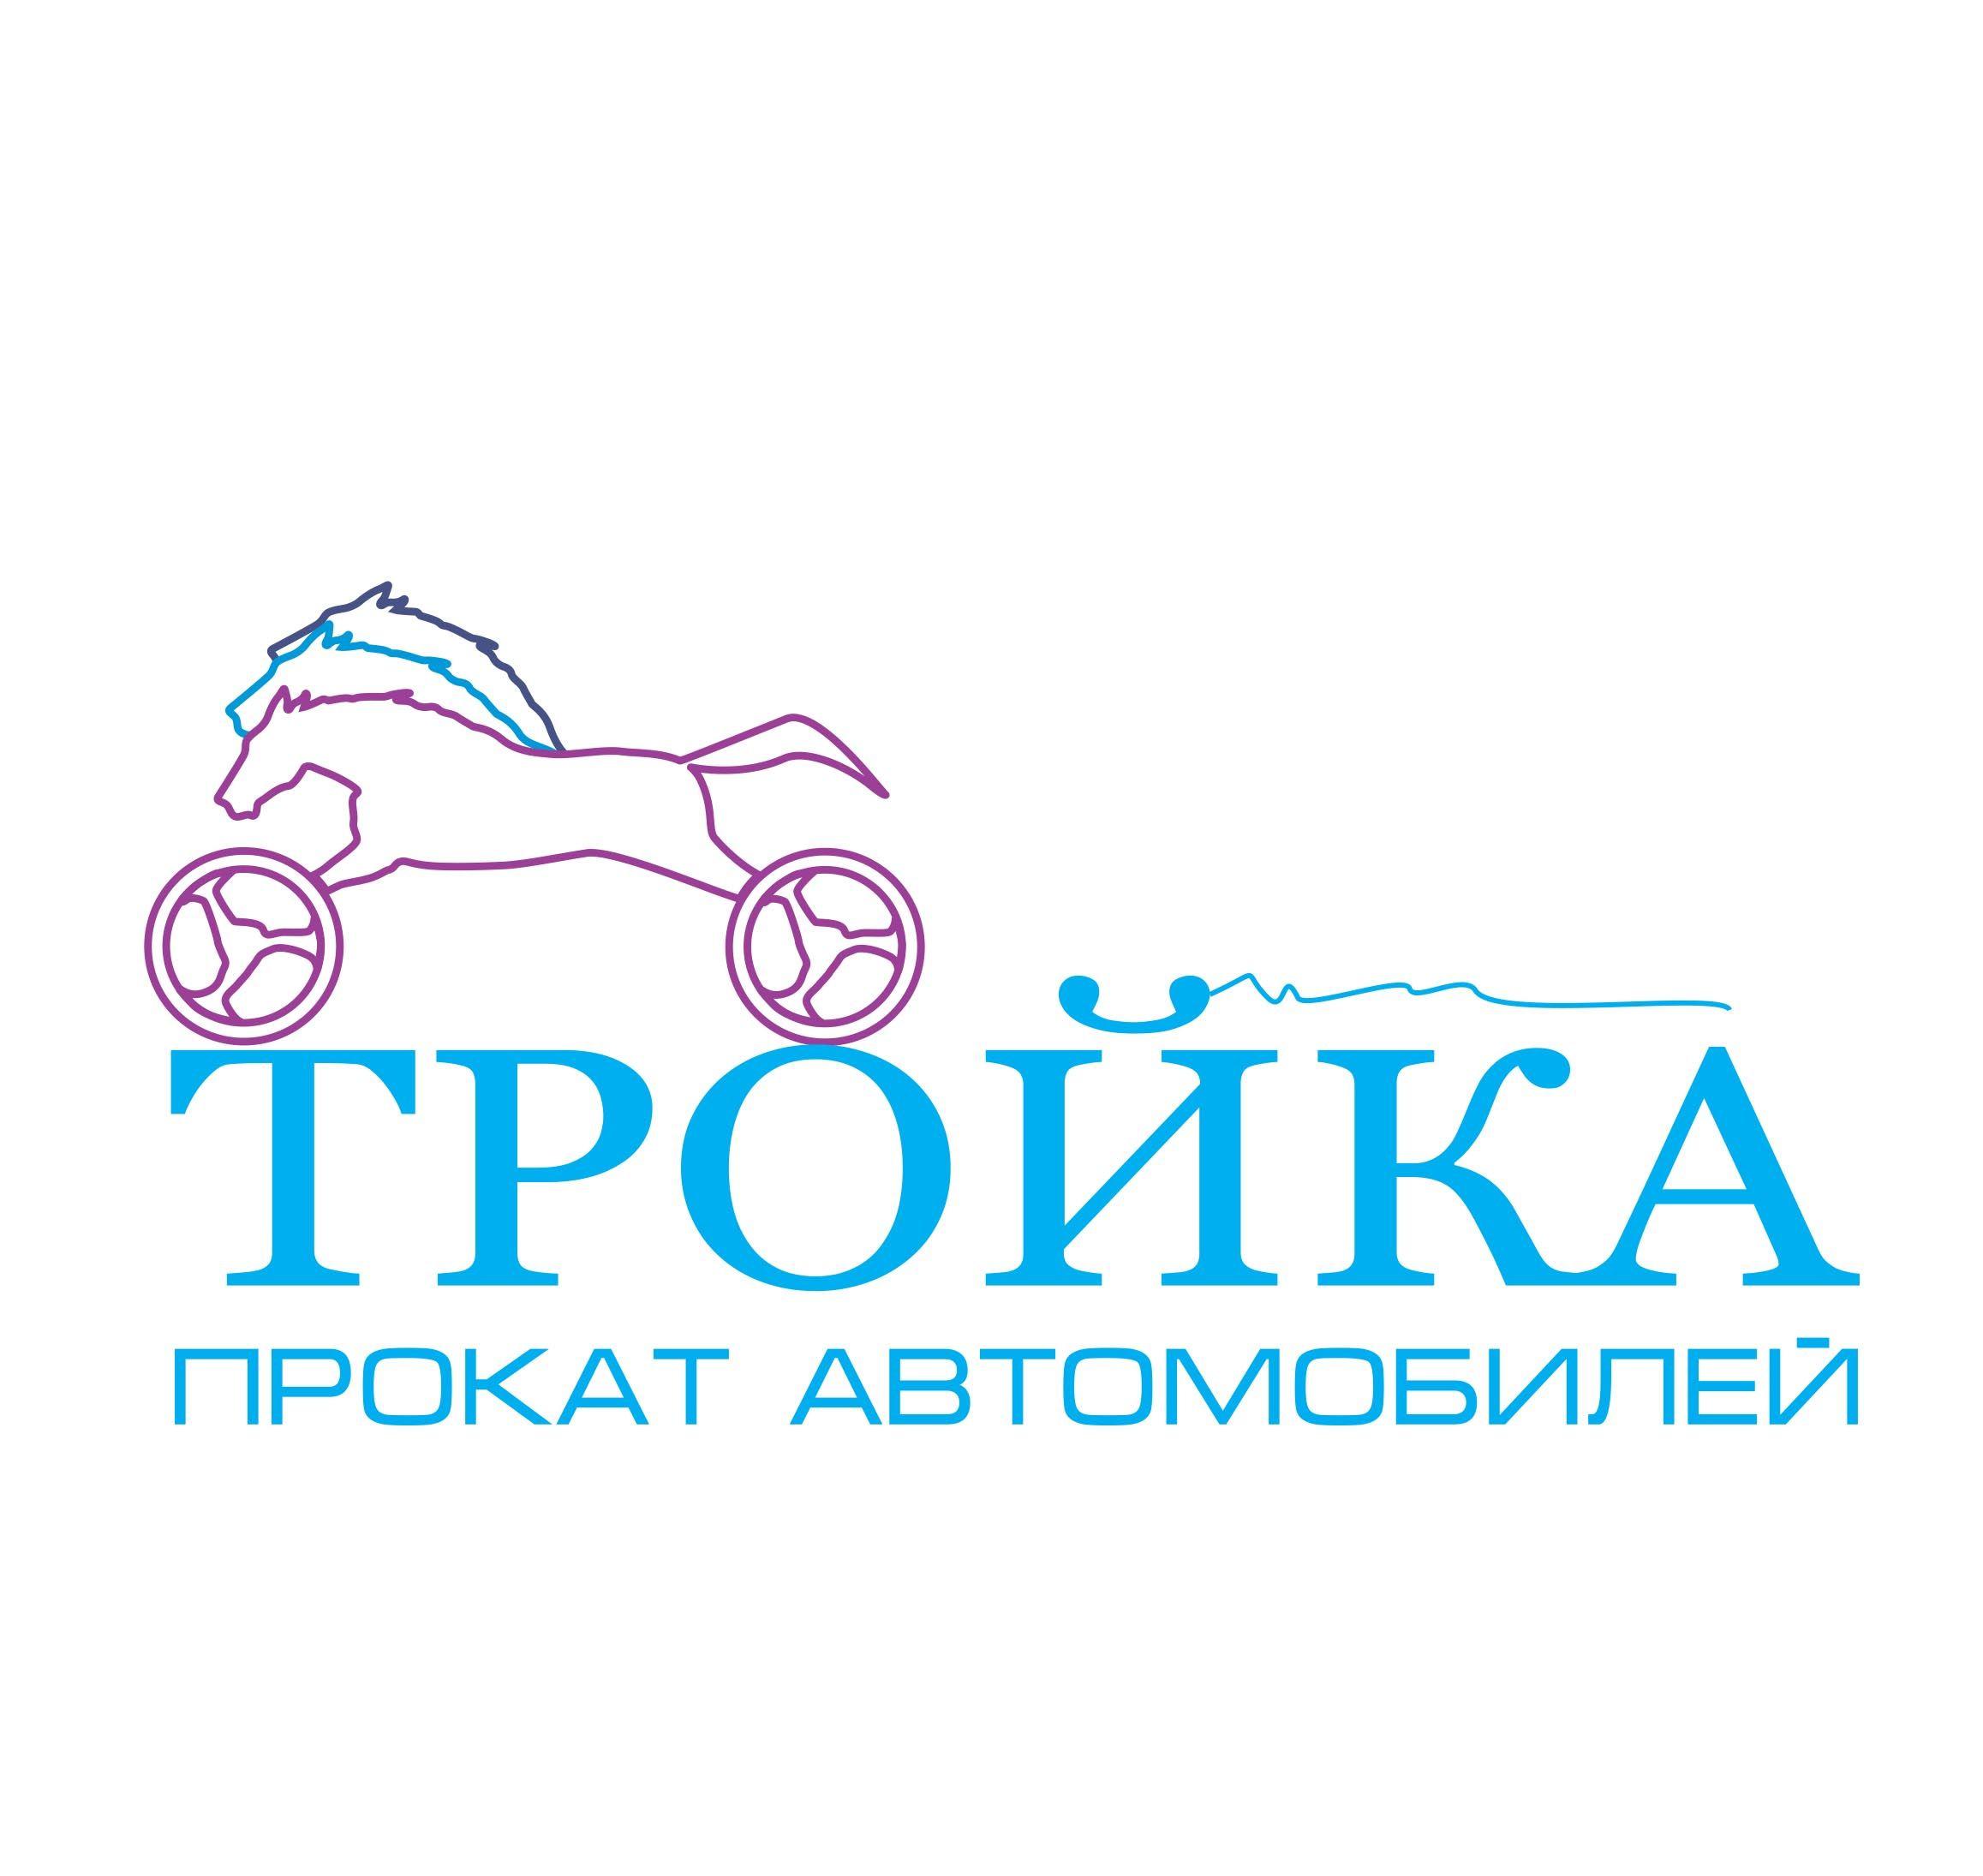 Логотип для компании проката автомобилей - дизайнер zooomb